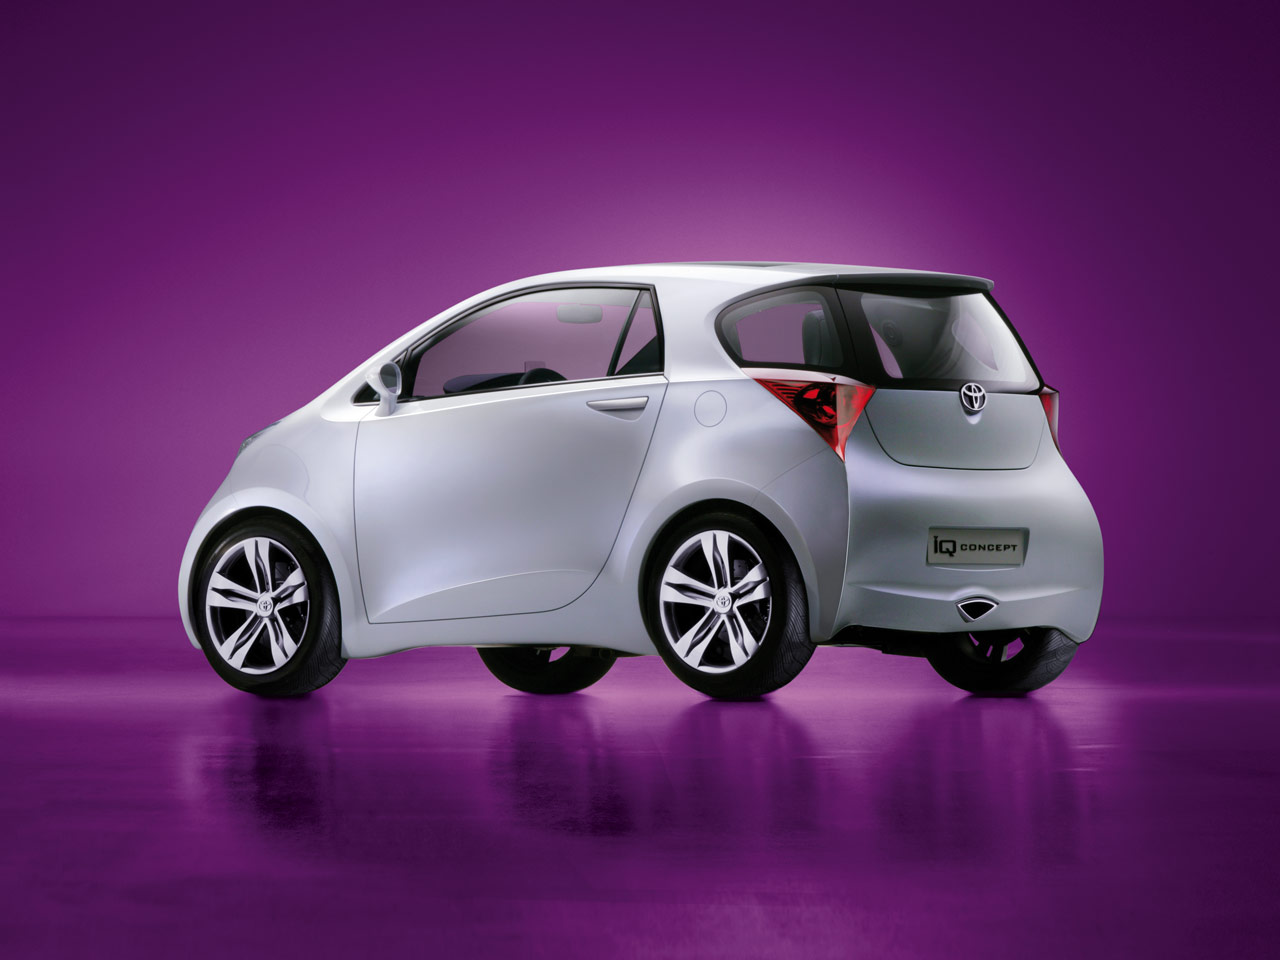 Toyota Iq Mini Car New Car Modification Review New Car